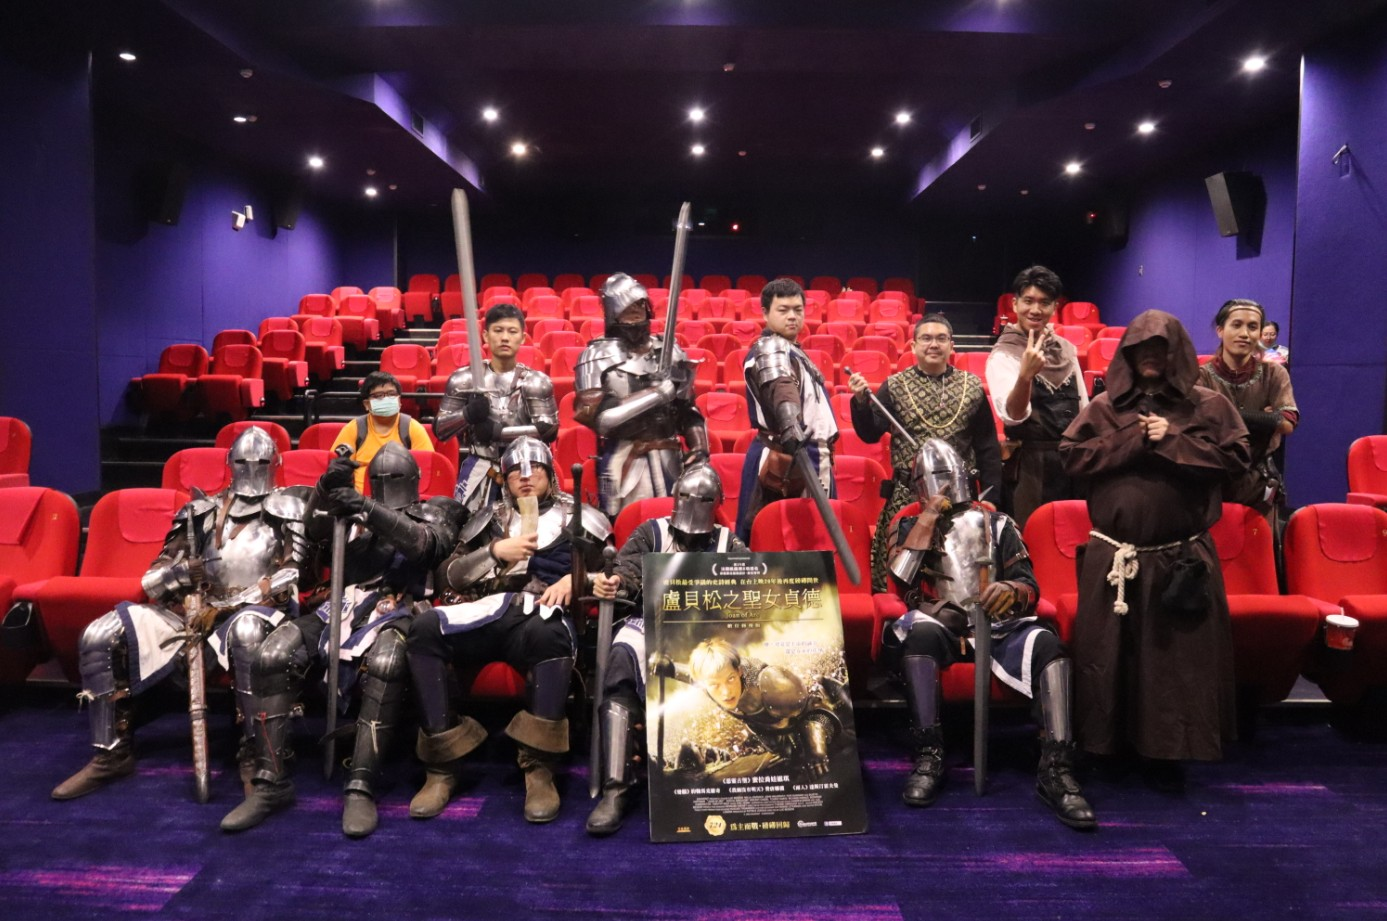 「Larp中古世紀生存遊戲團隊」首次著裝於影城觀賞《盧貝松之聖女貞德:數位修復版》